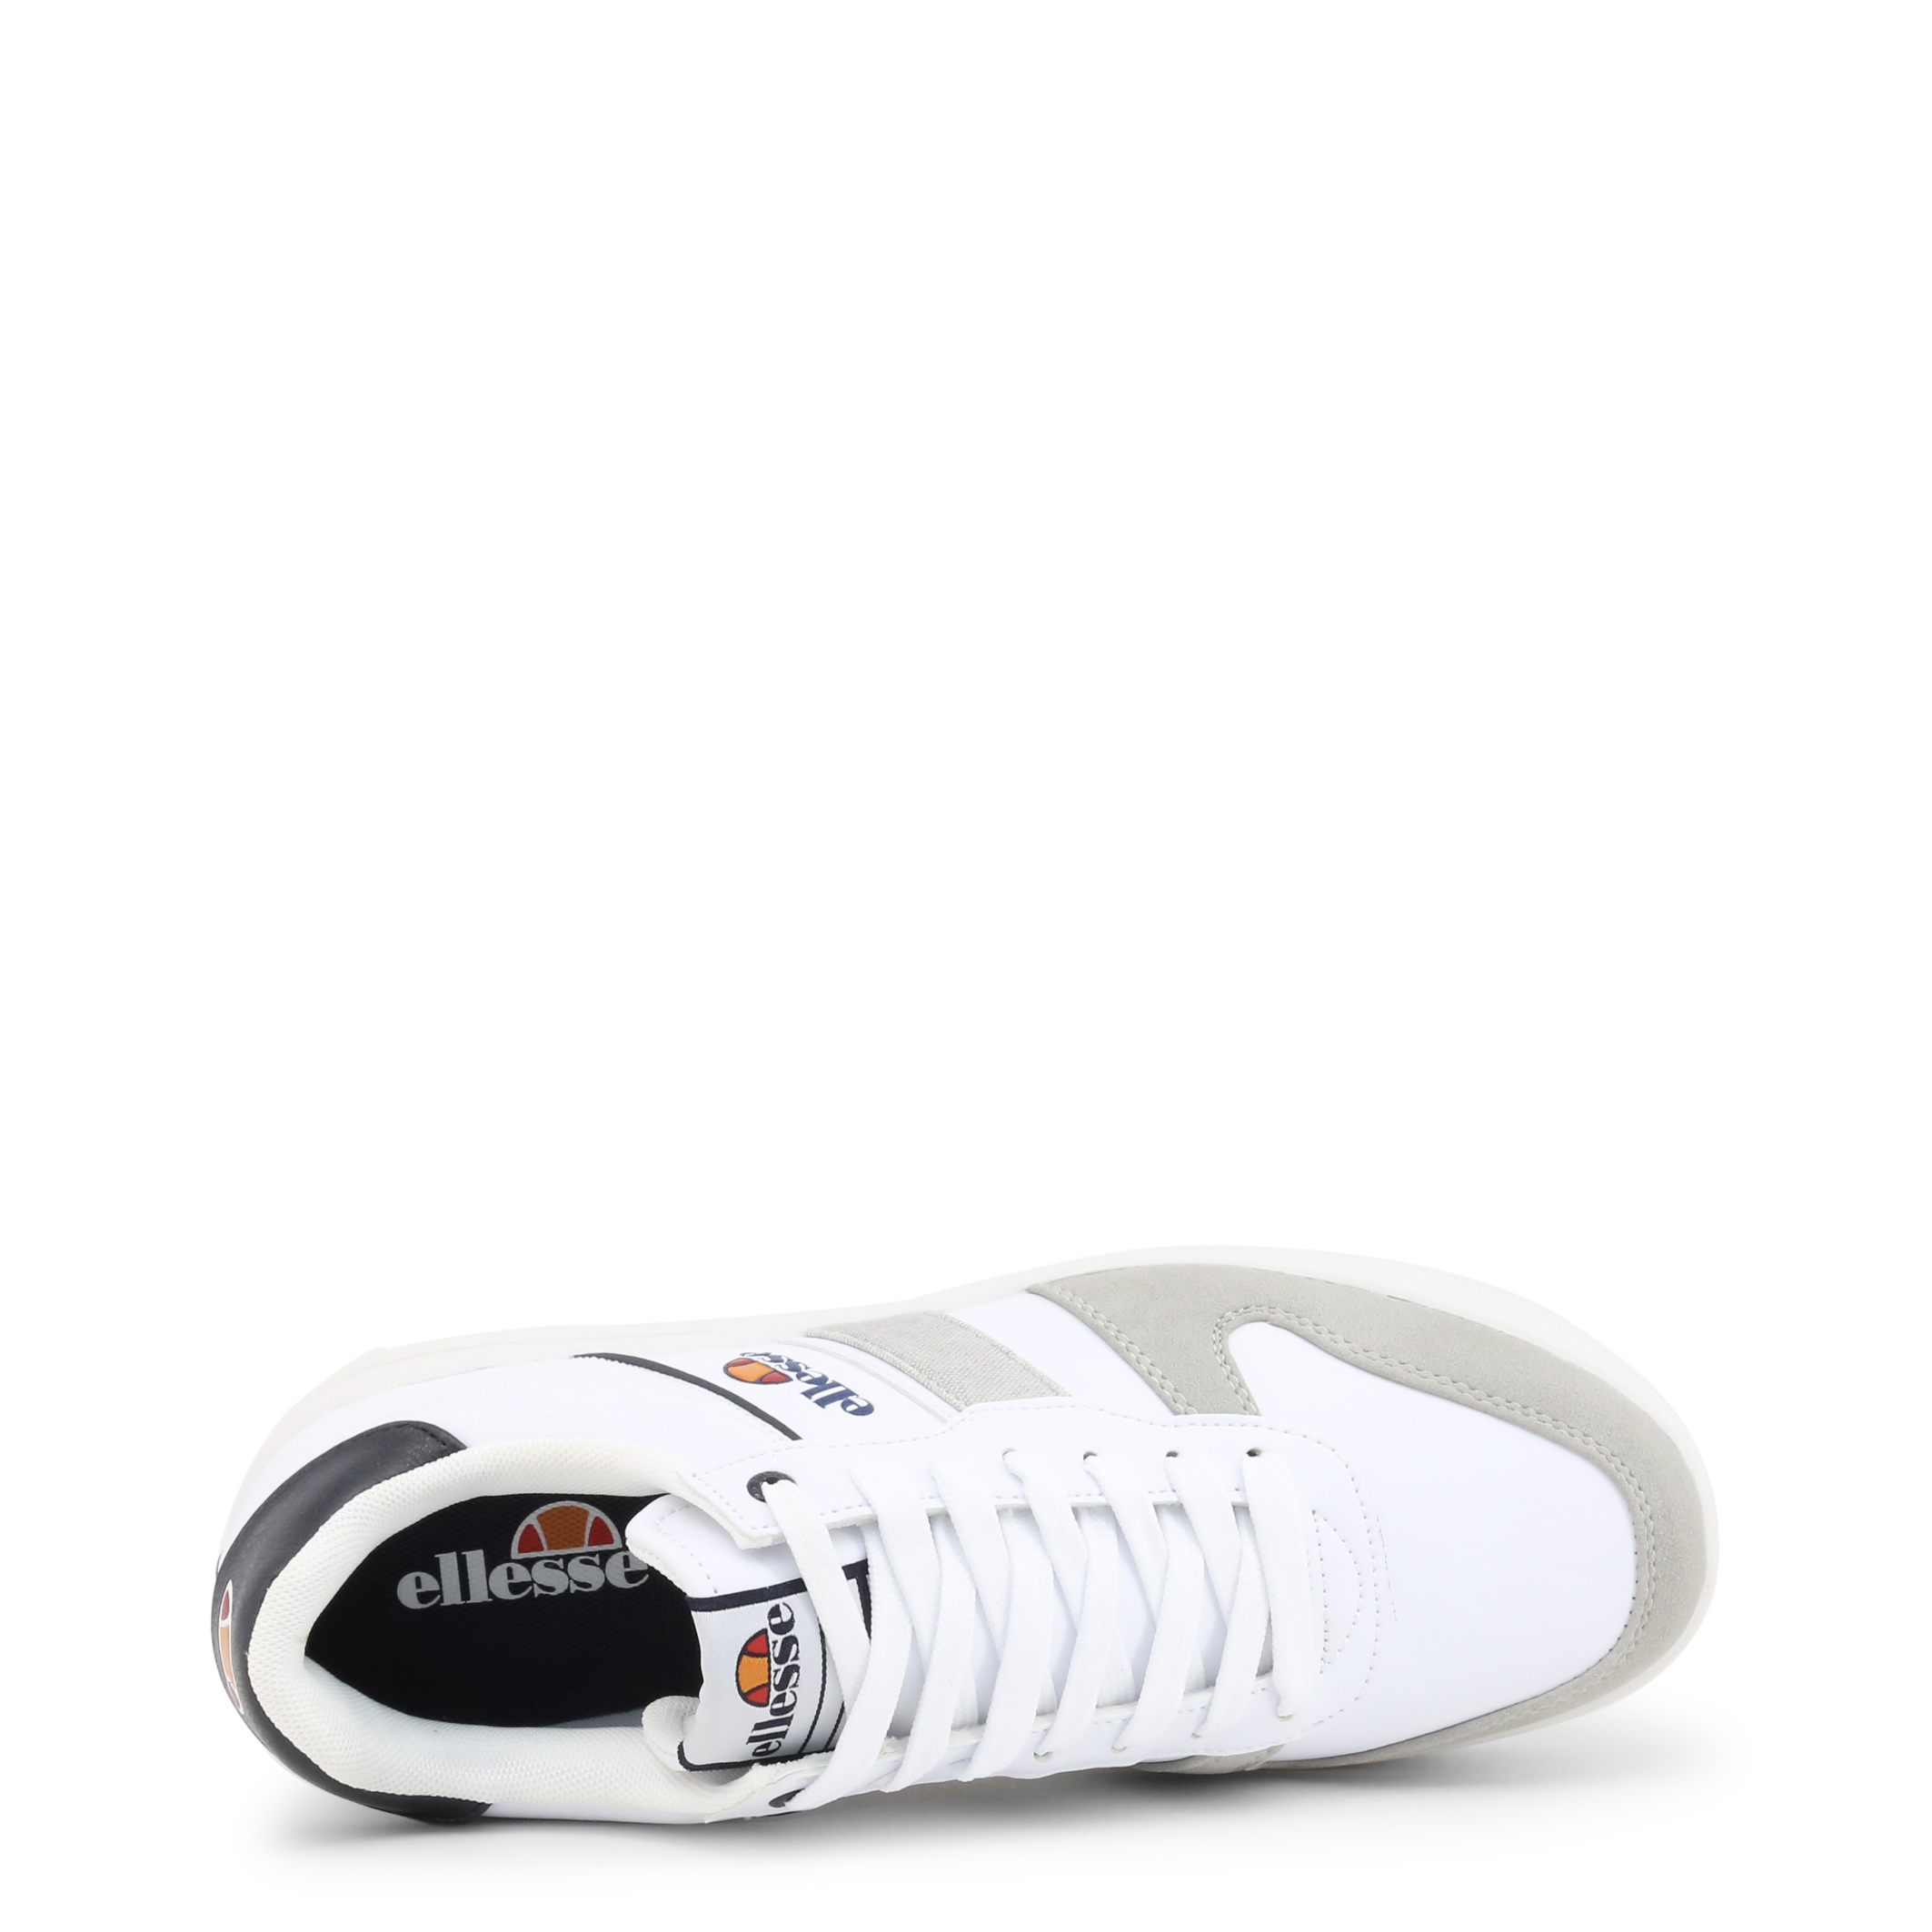 Baskets / Sport  Ellesse EL02M80425_01 white